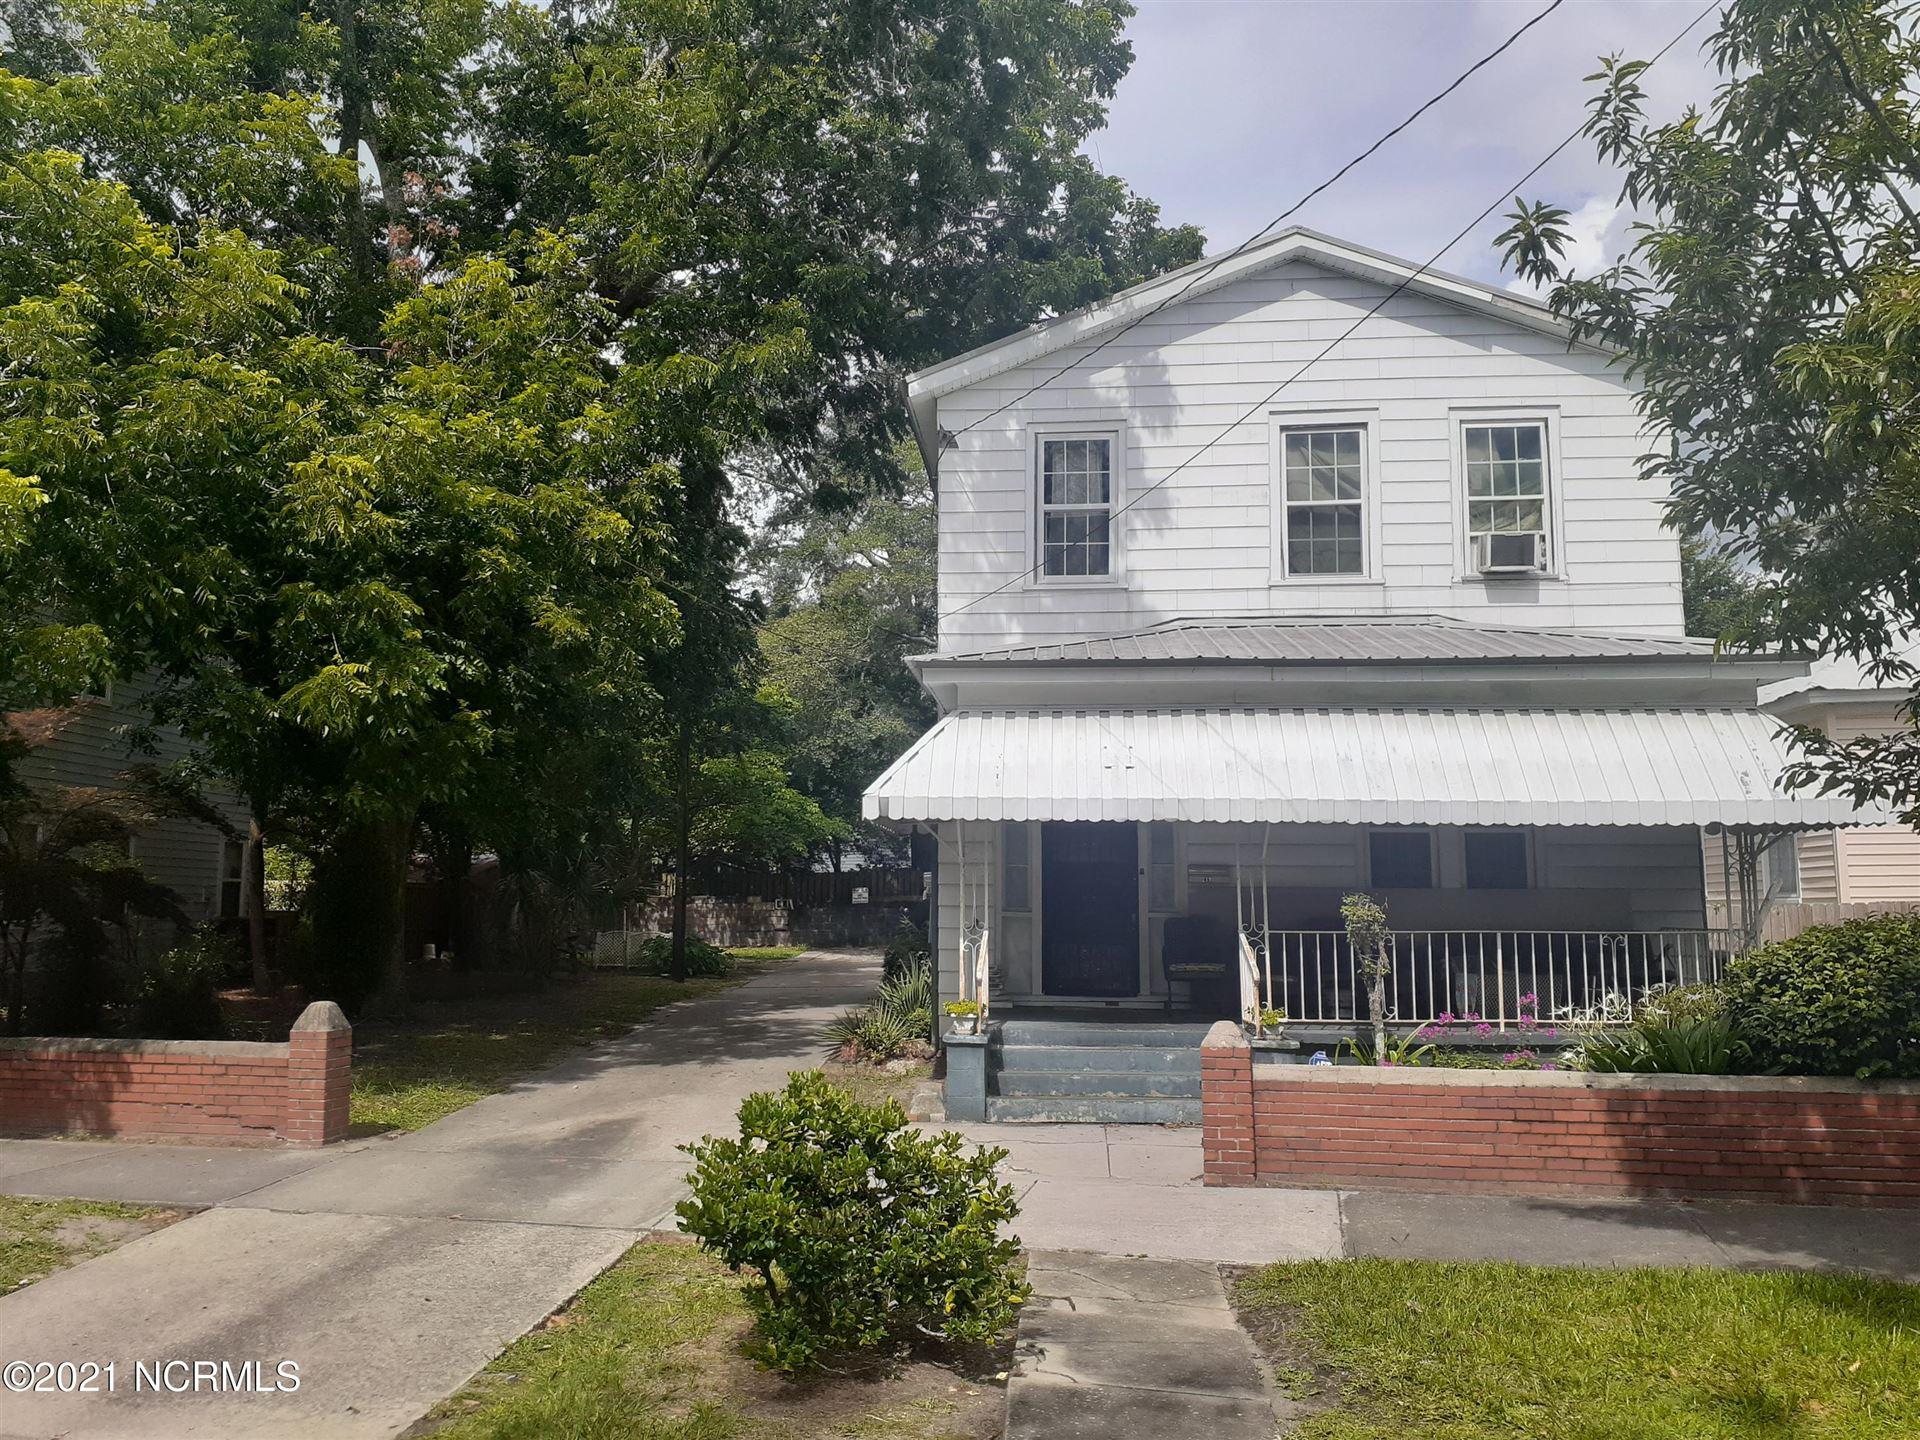 Photo for 219 Mcrae Street, Wilmington, NC 28401 (MLS # 100280873)